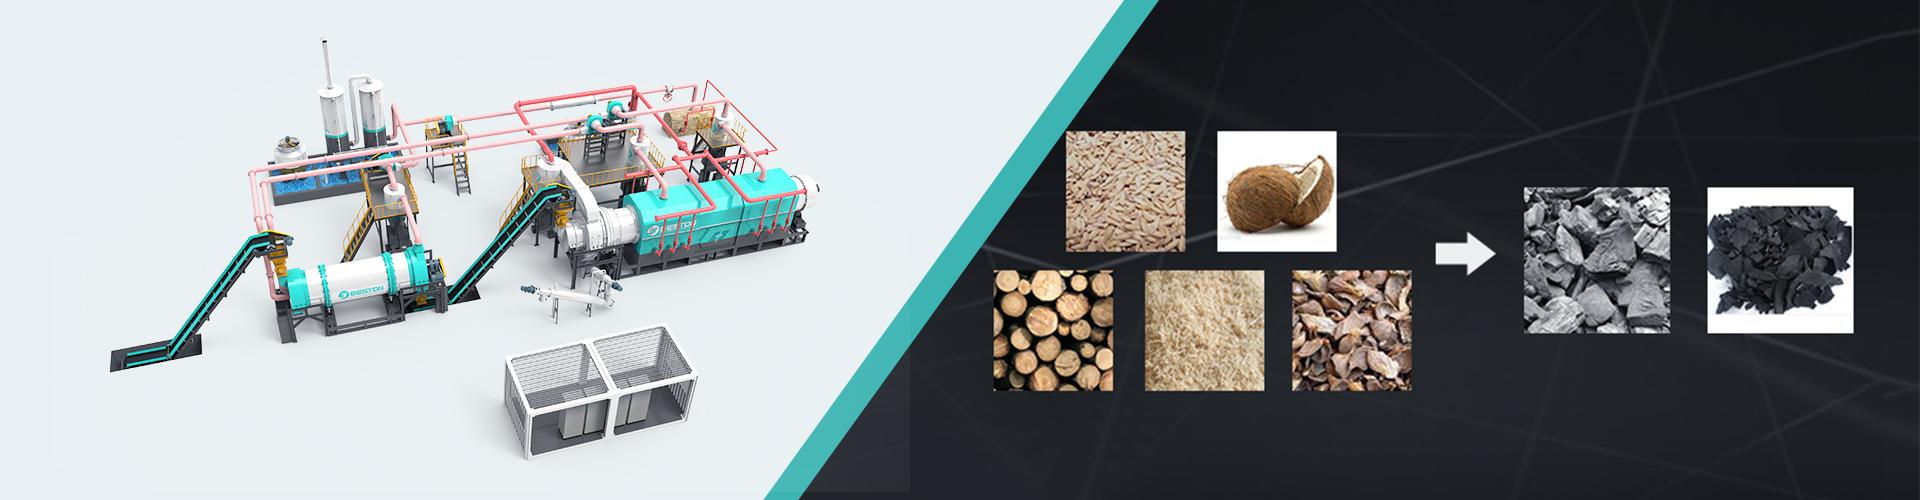 Баннер для производства древесного угля